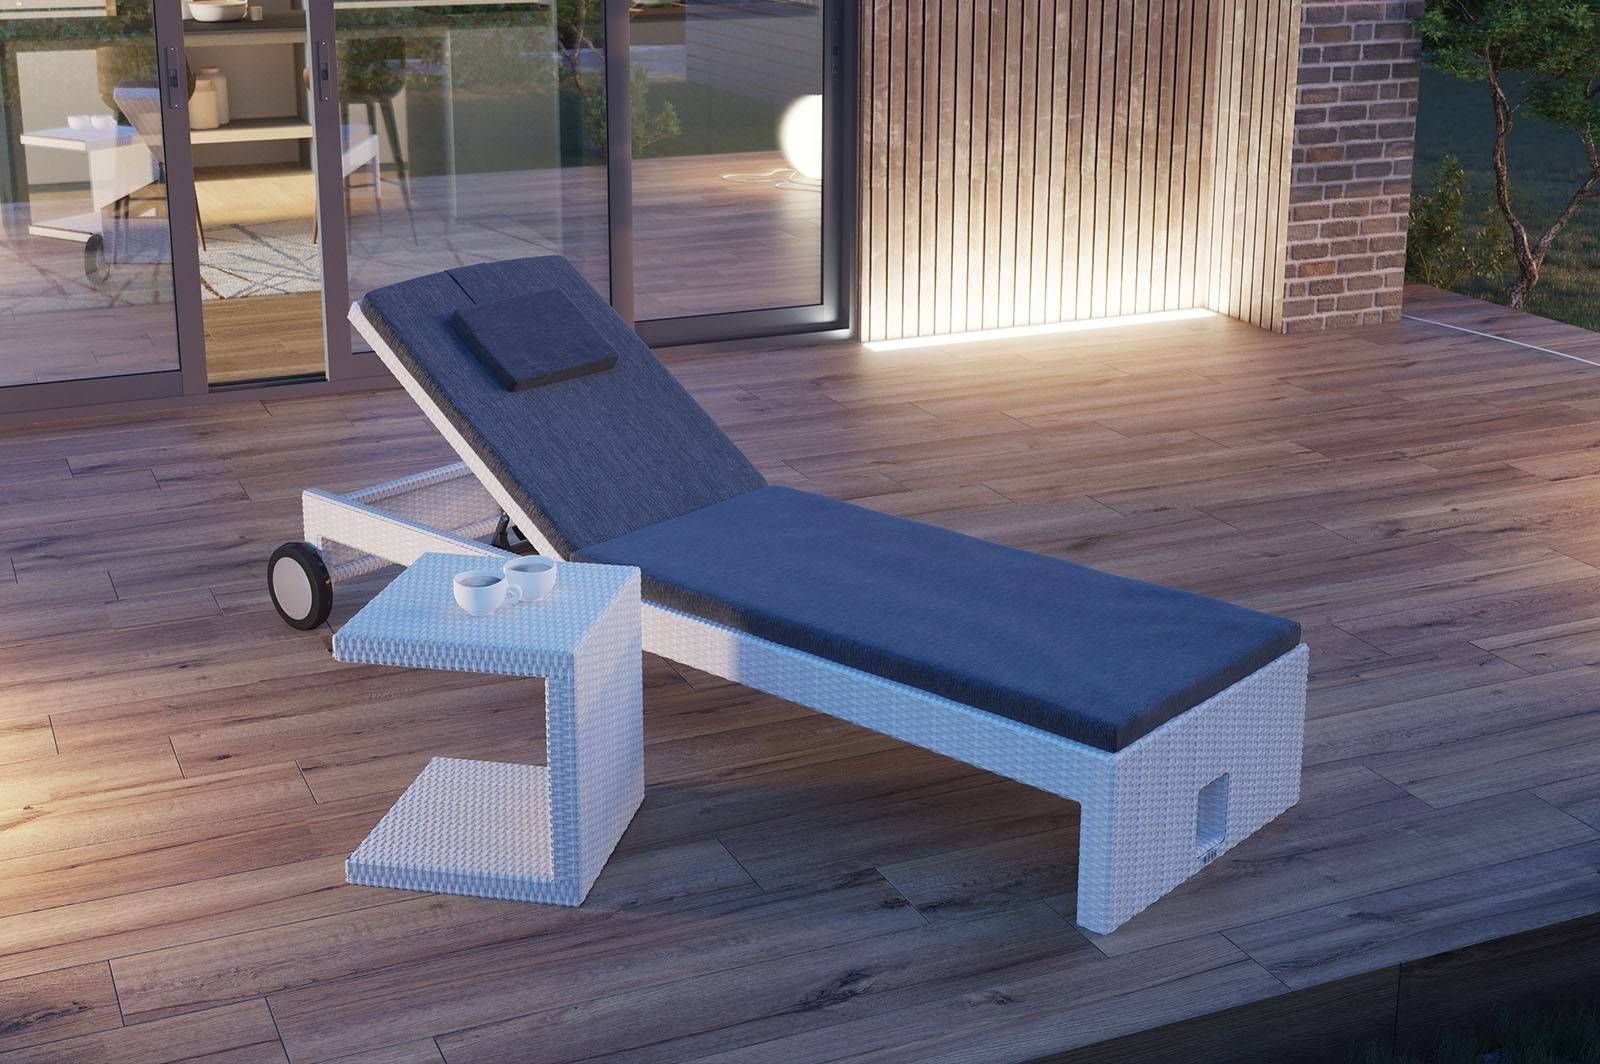 Lezak Ogrodowy Julia Sklep Internetowy Garden Space Furniture Home Decor Outdoor Decor